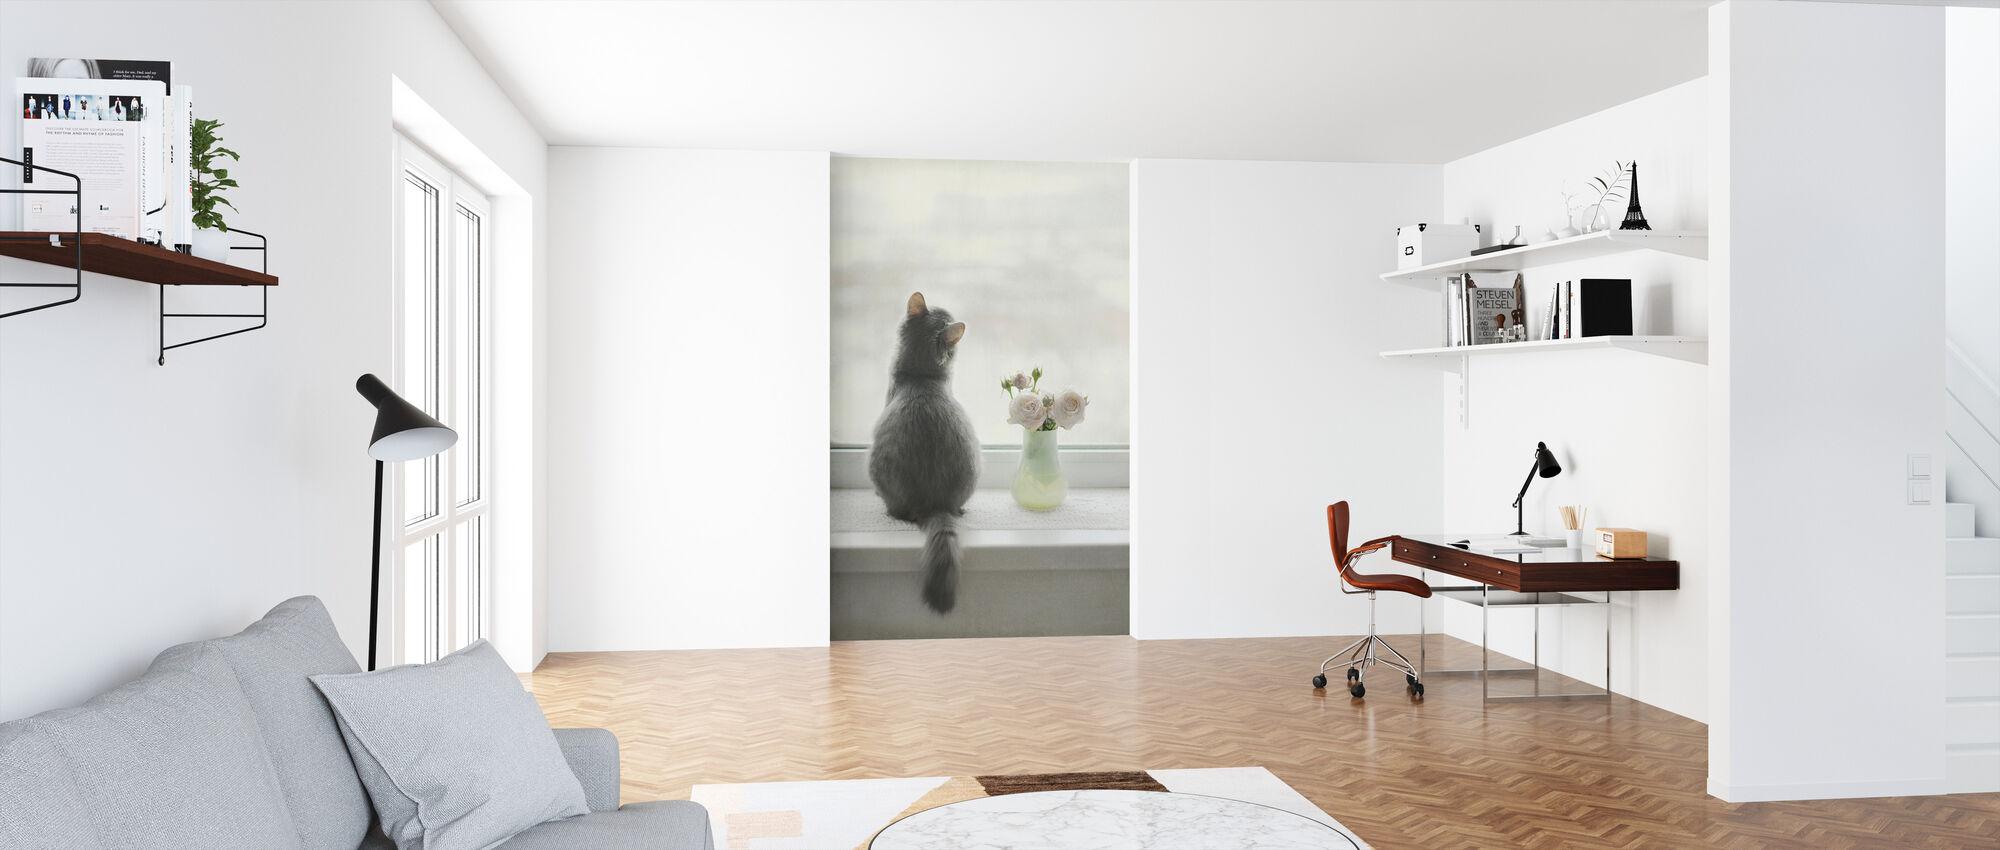 Kitty Dreaming - Wallpaper - Office